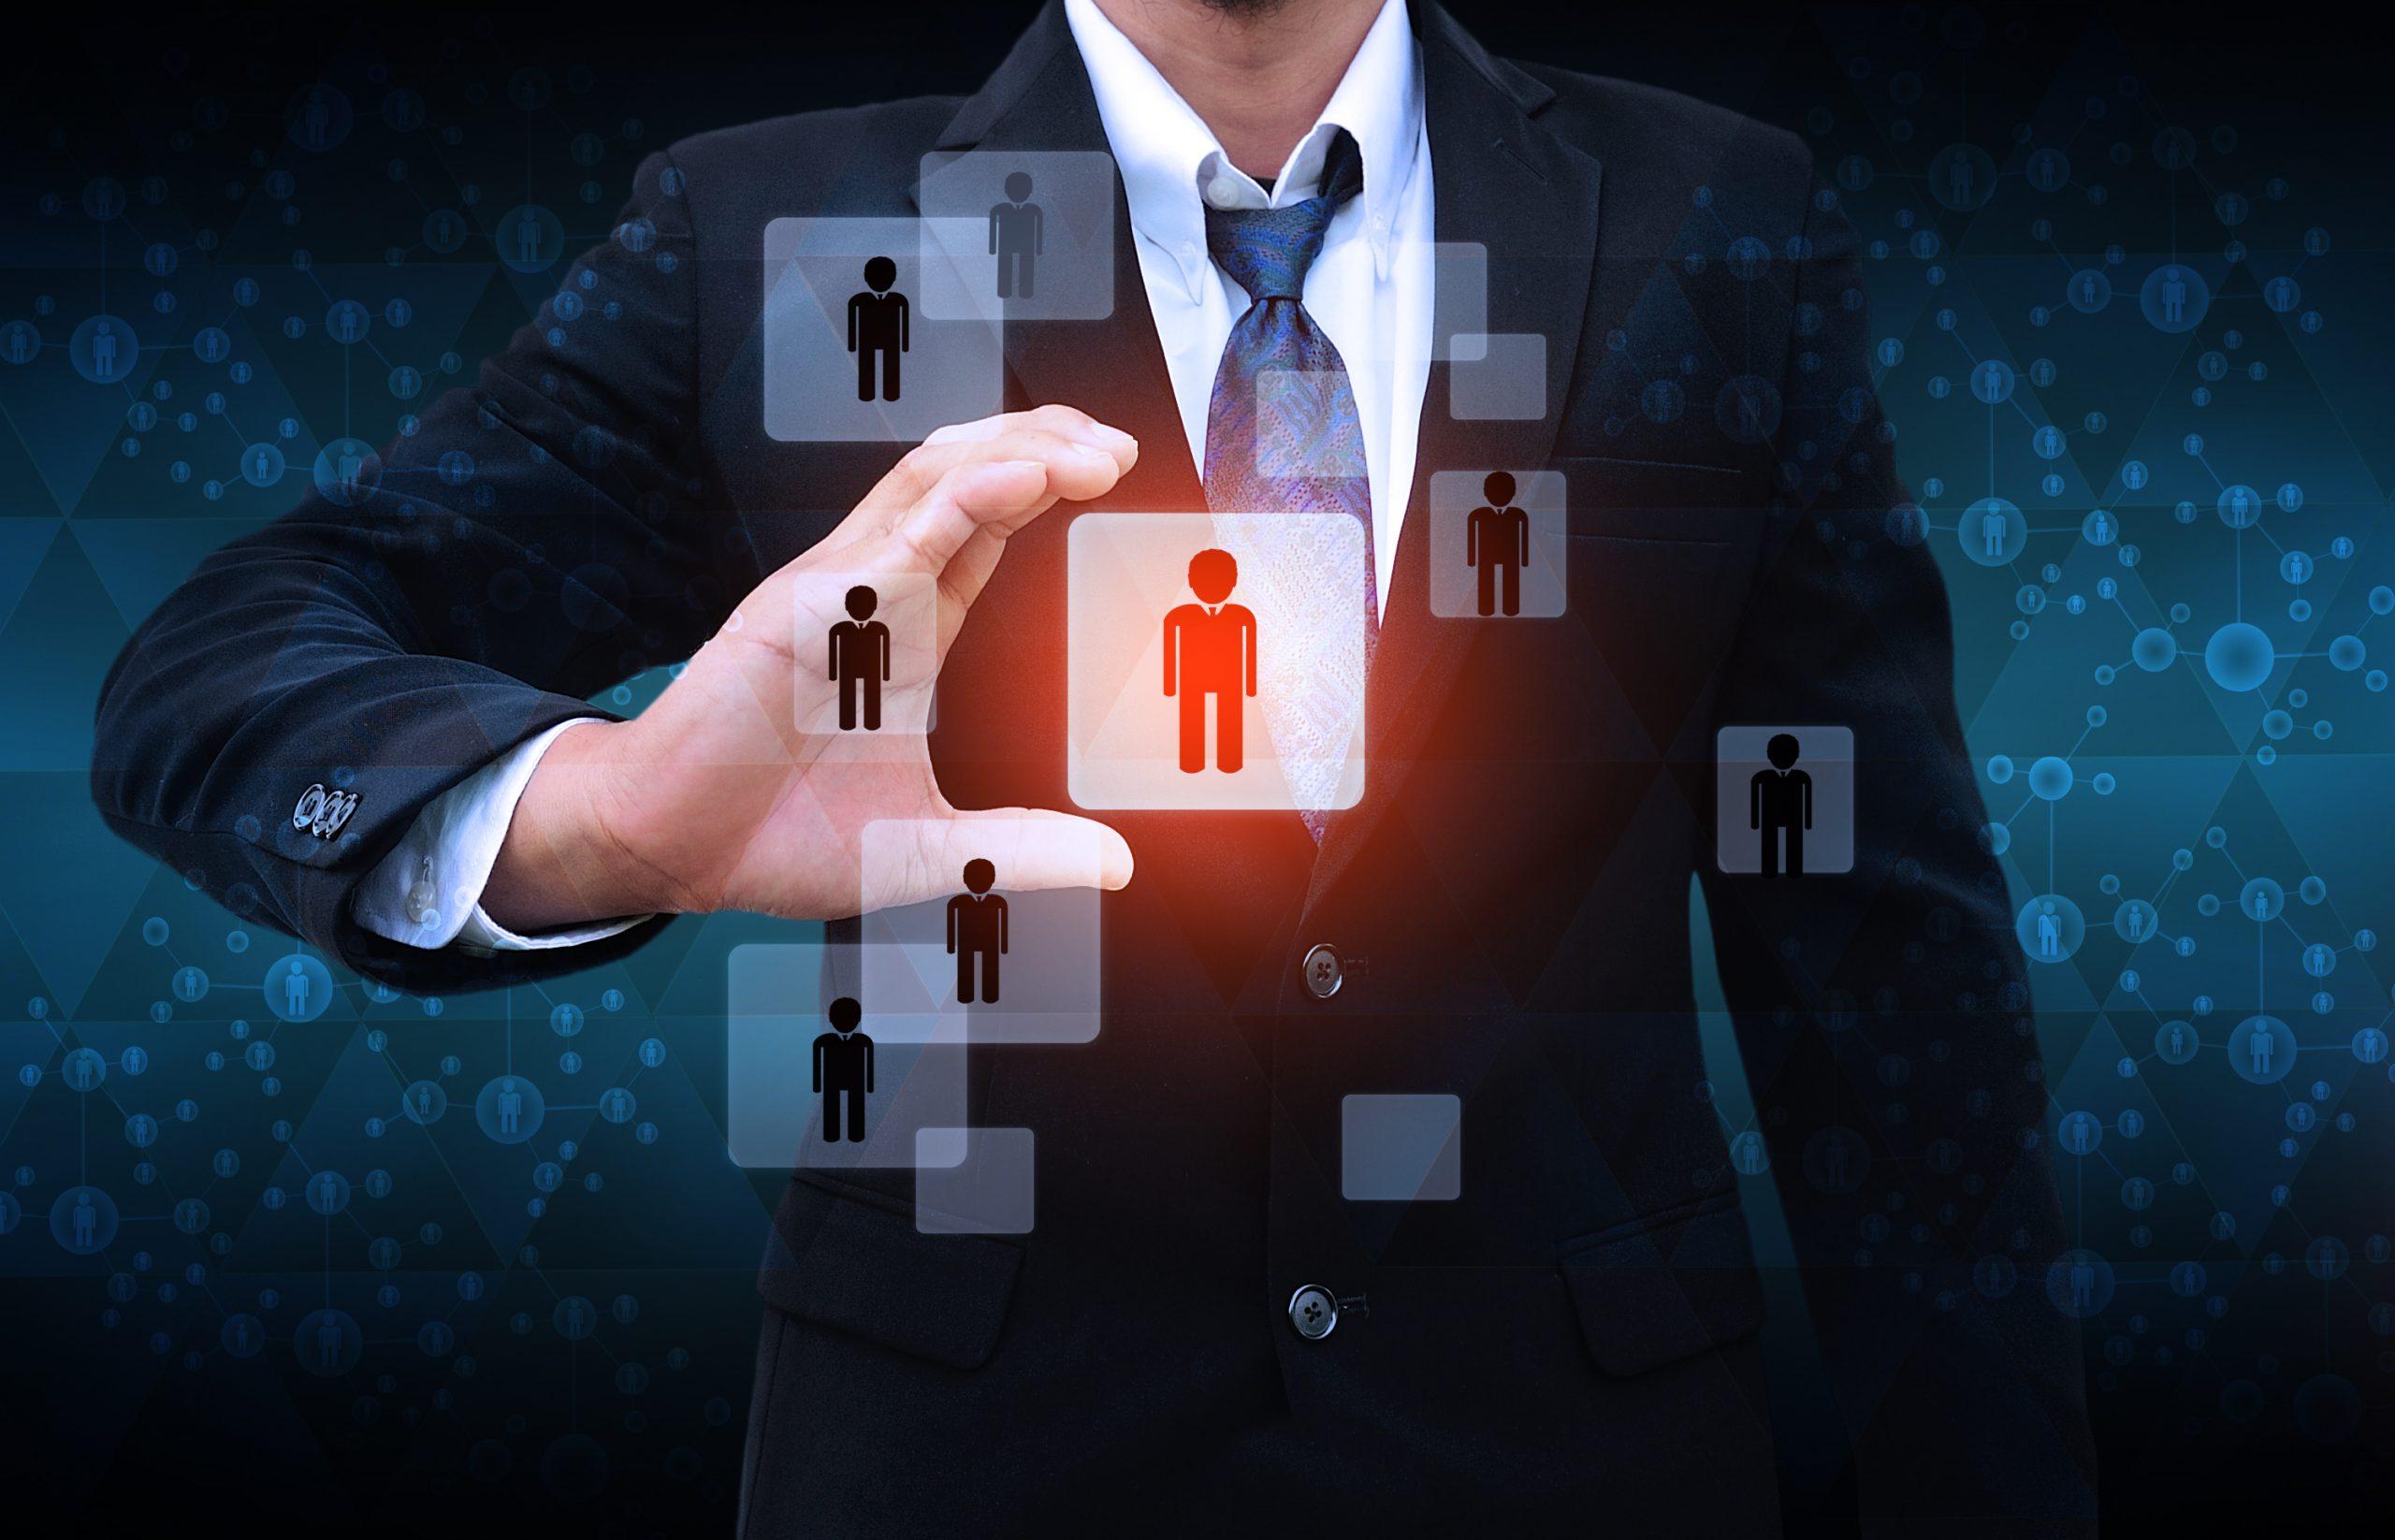 Psicosoft - 'Self awareness' en sector telecomunicaciones